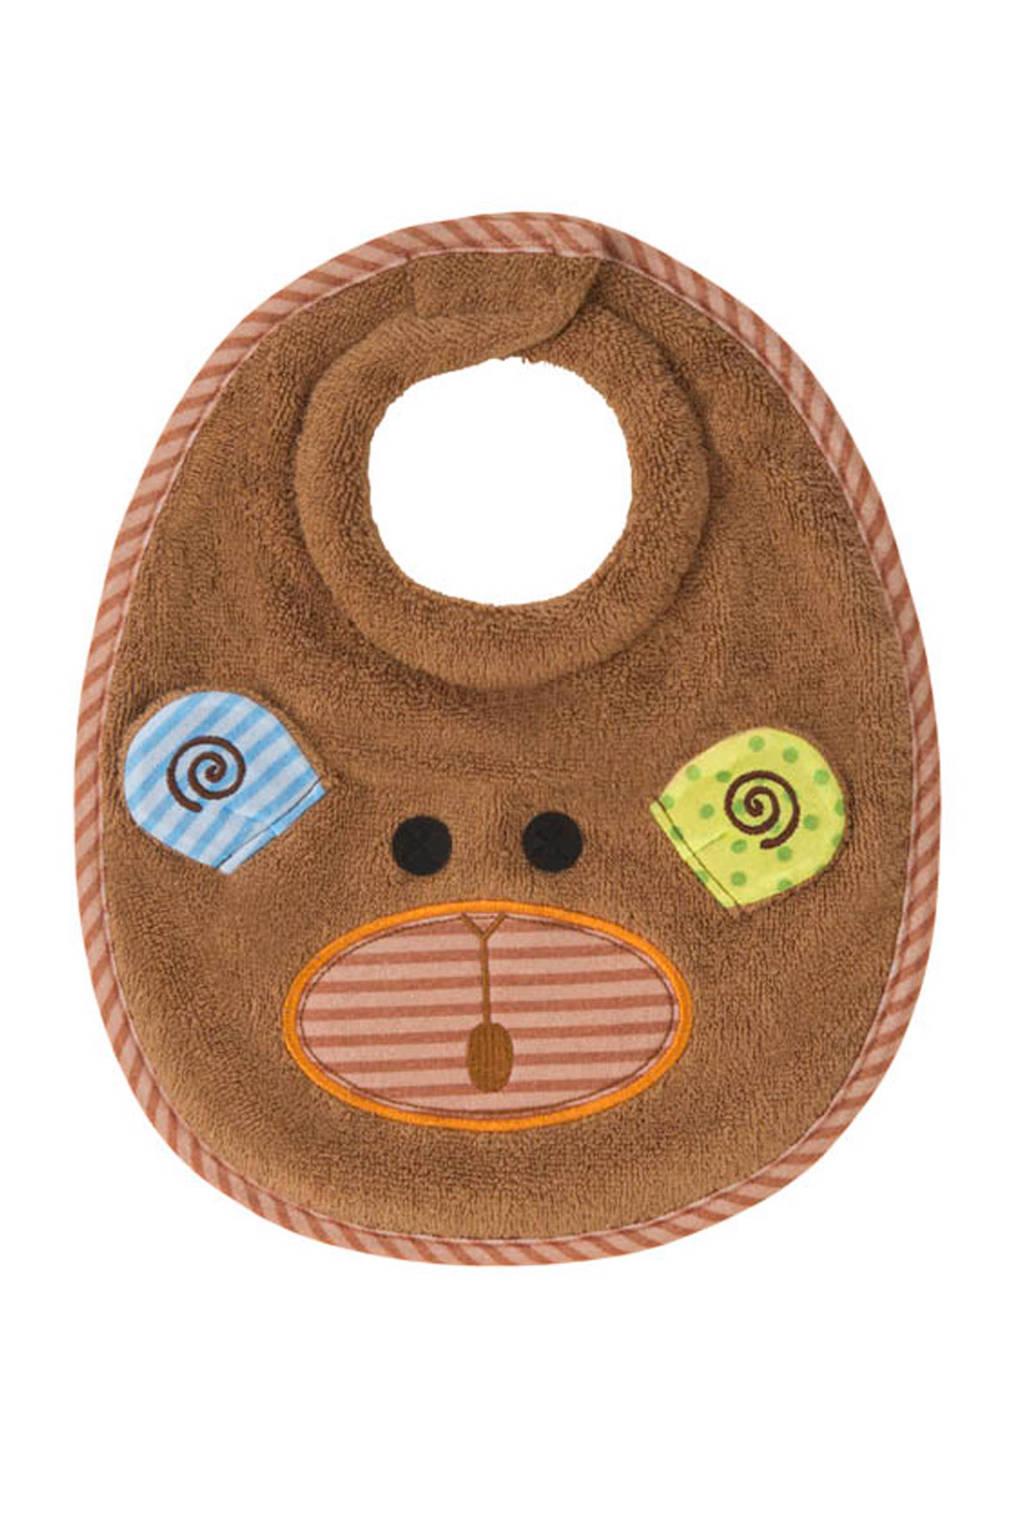 Zoocchini Max the Monkey slabbetje, Bruin